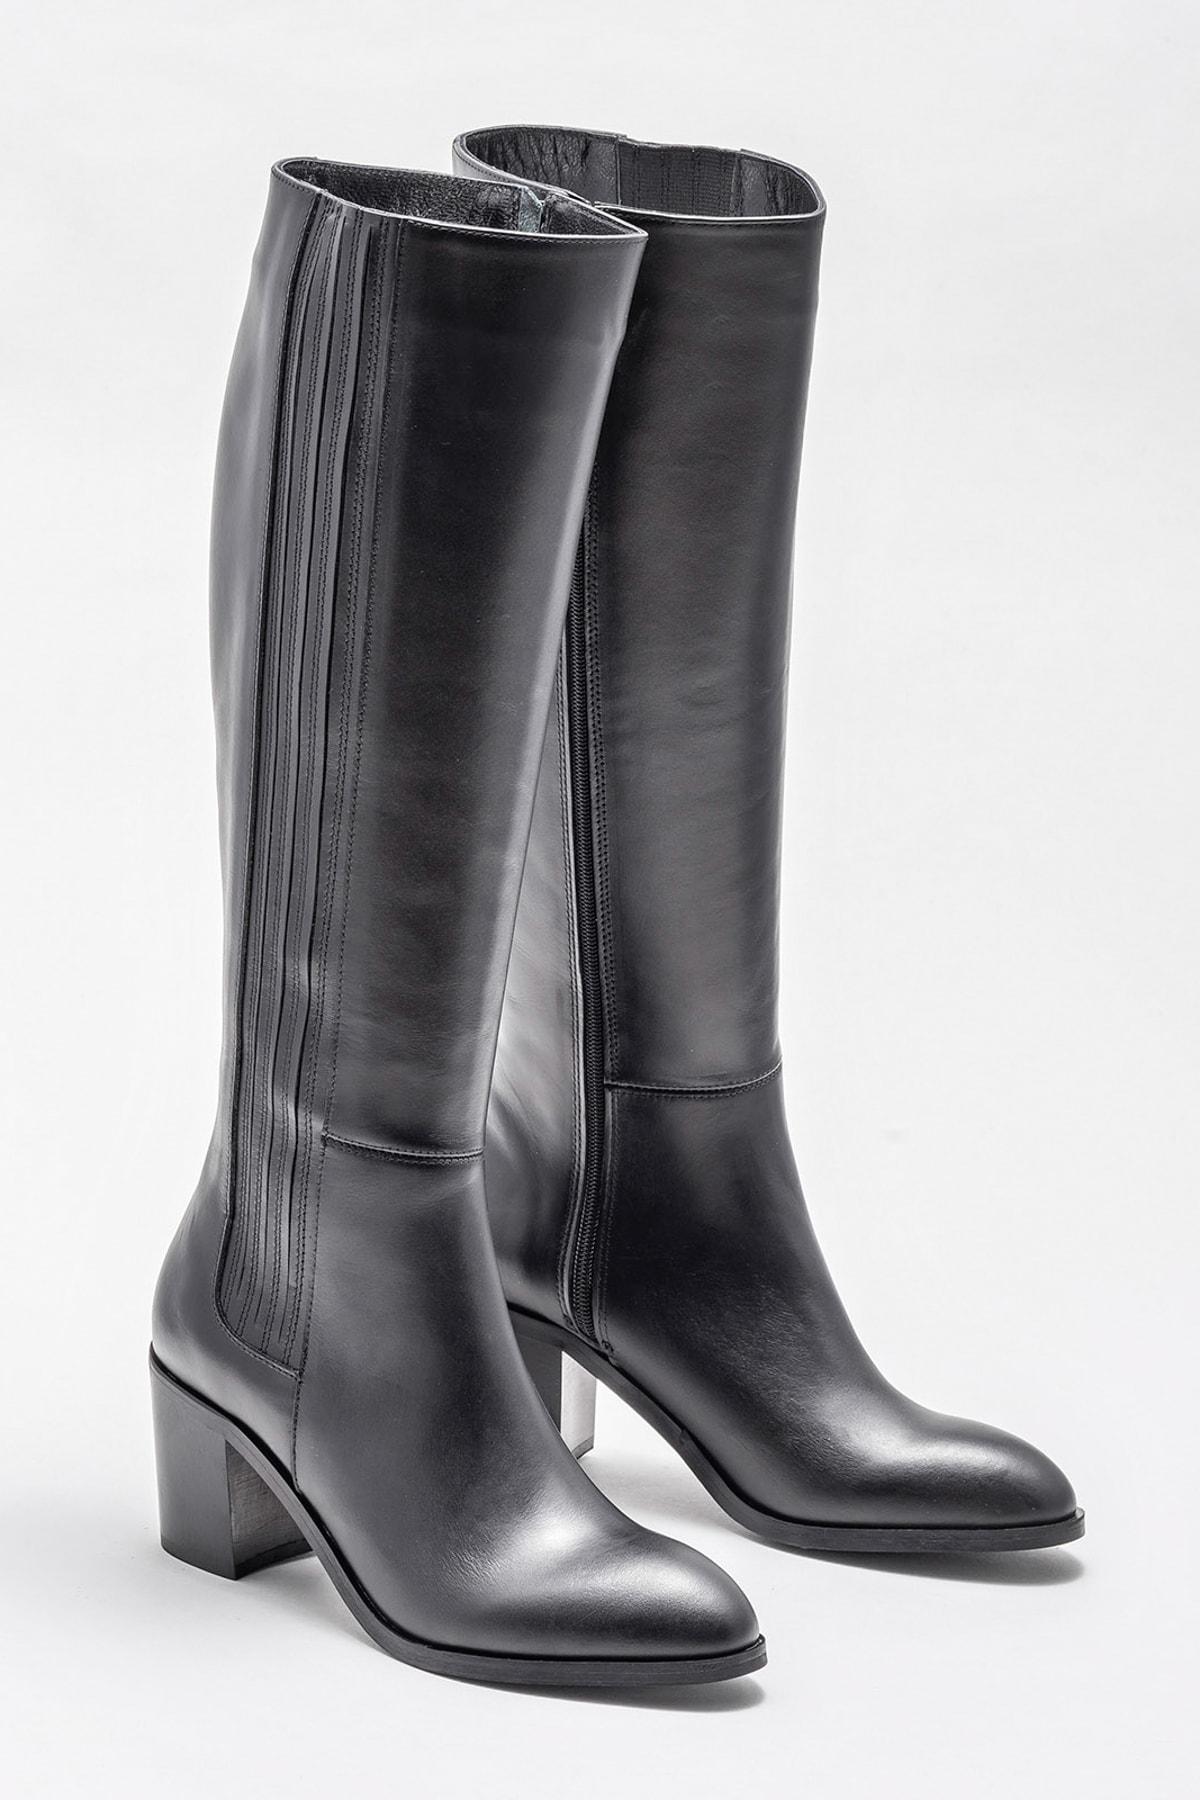 Elle Shoes Kadın RENIE-1 Çizme 20K012 2